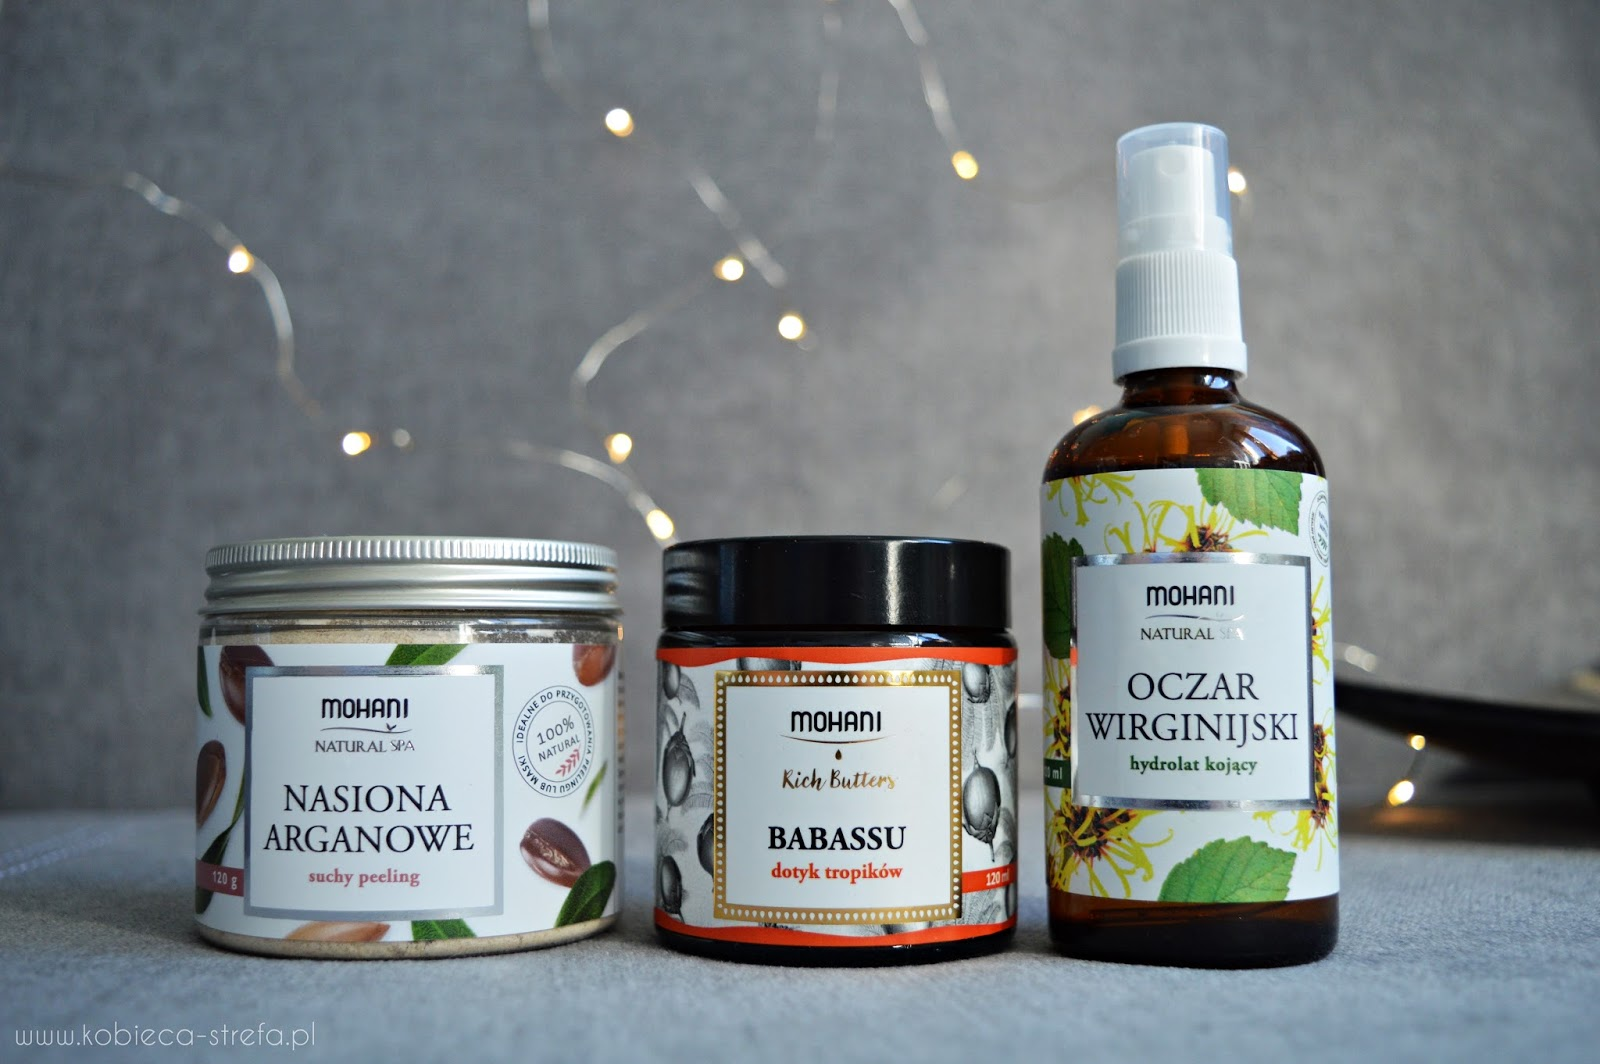 Mohani - oczar wirginijski, peeling nasiona arganowe i masło babassu